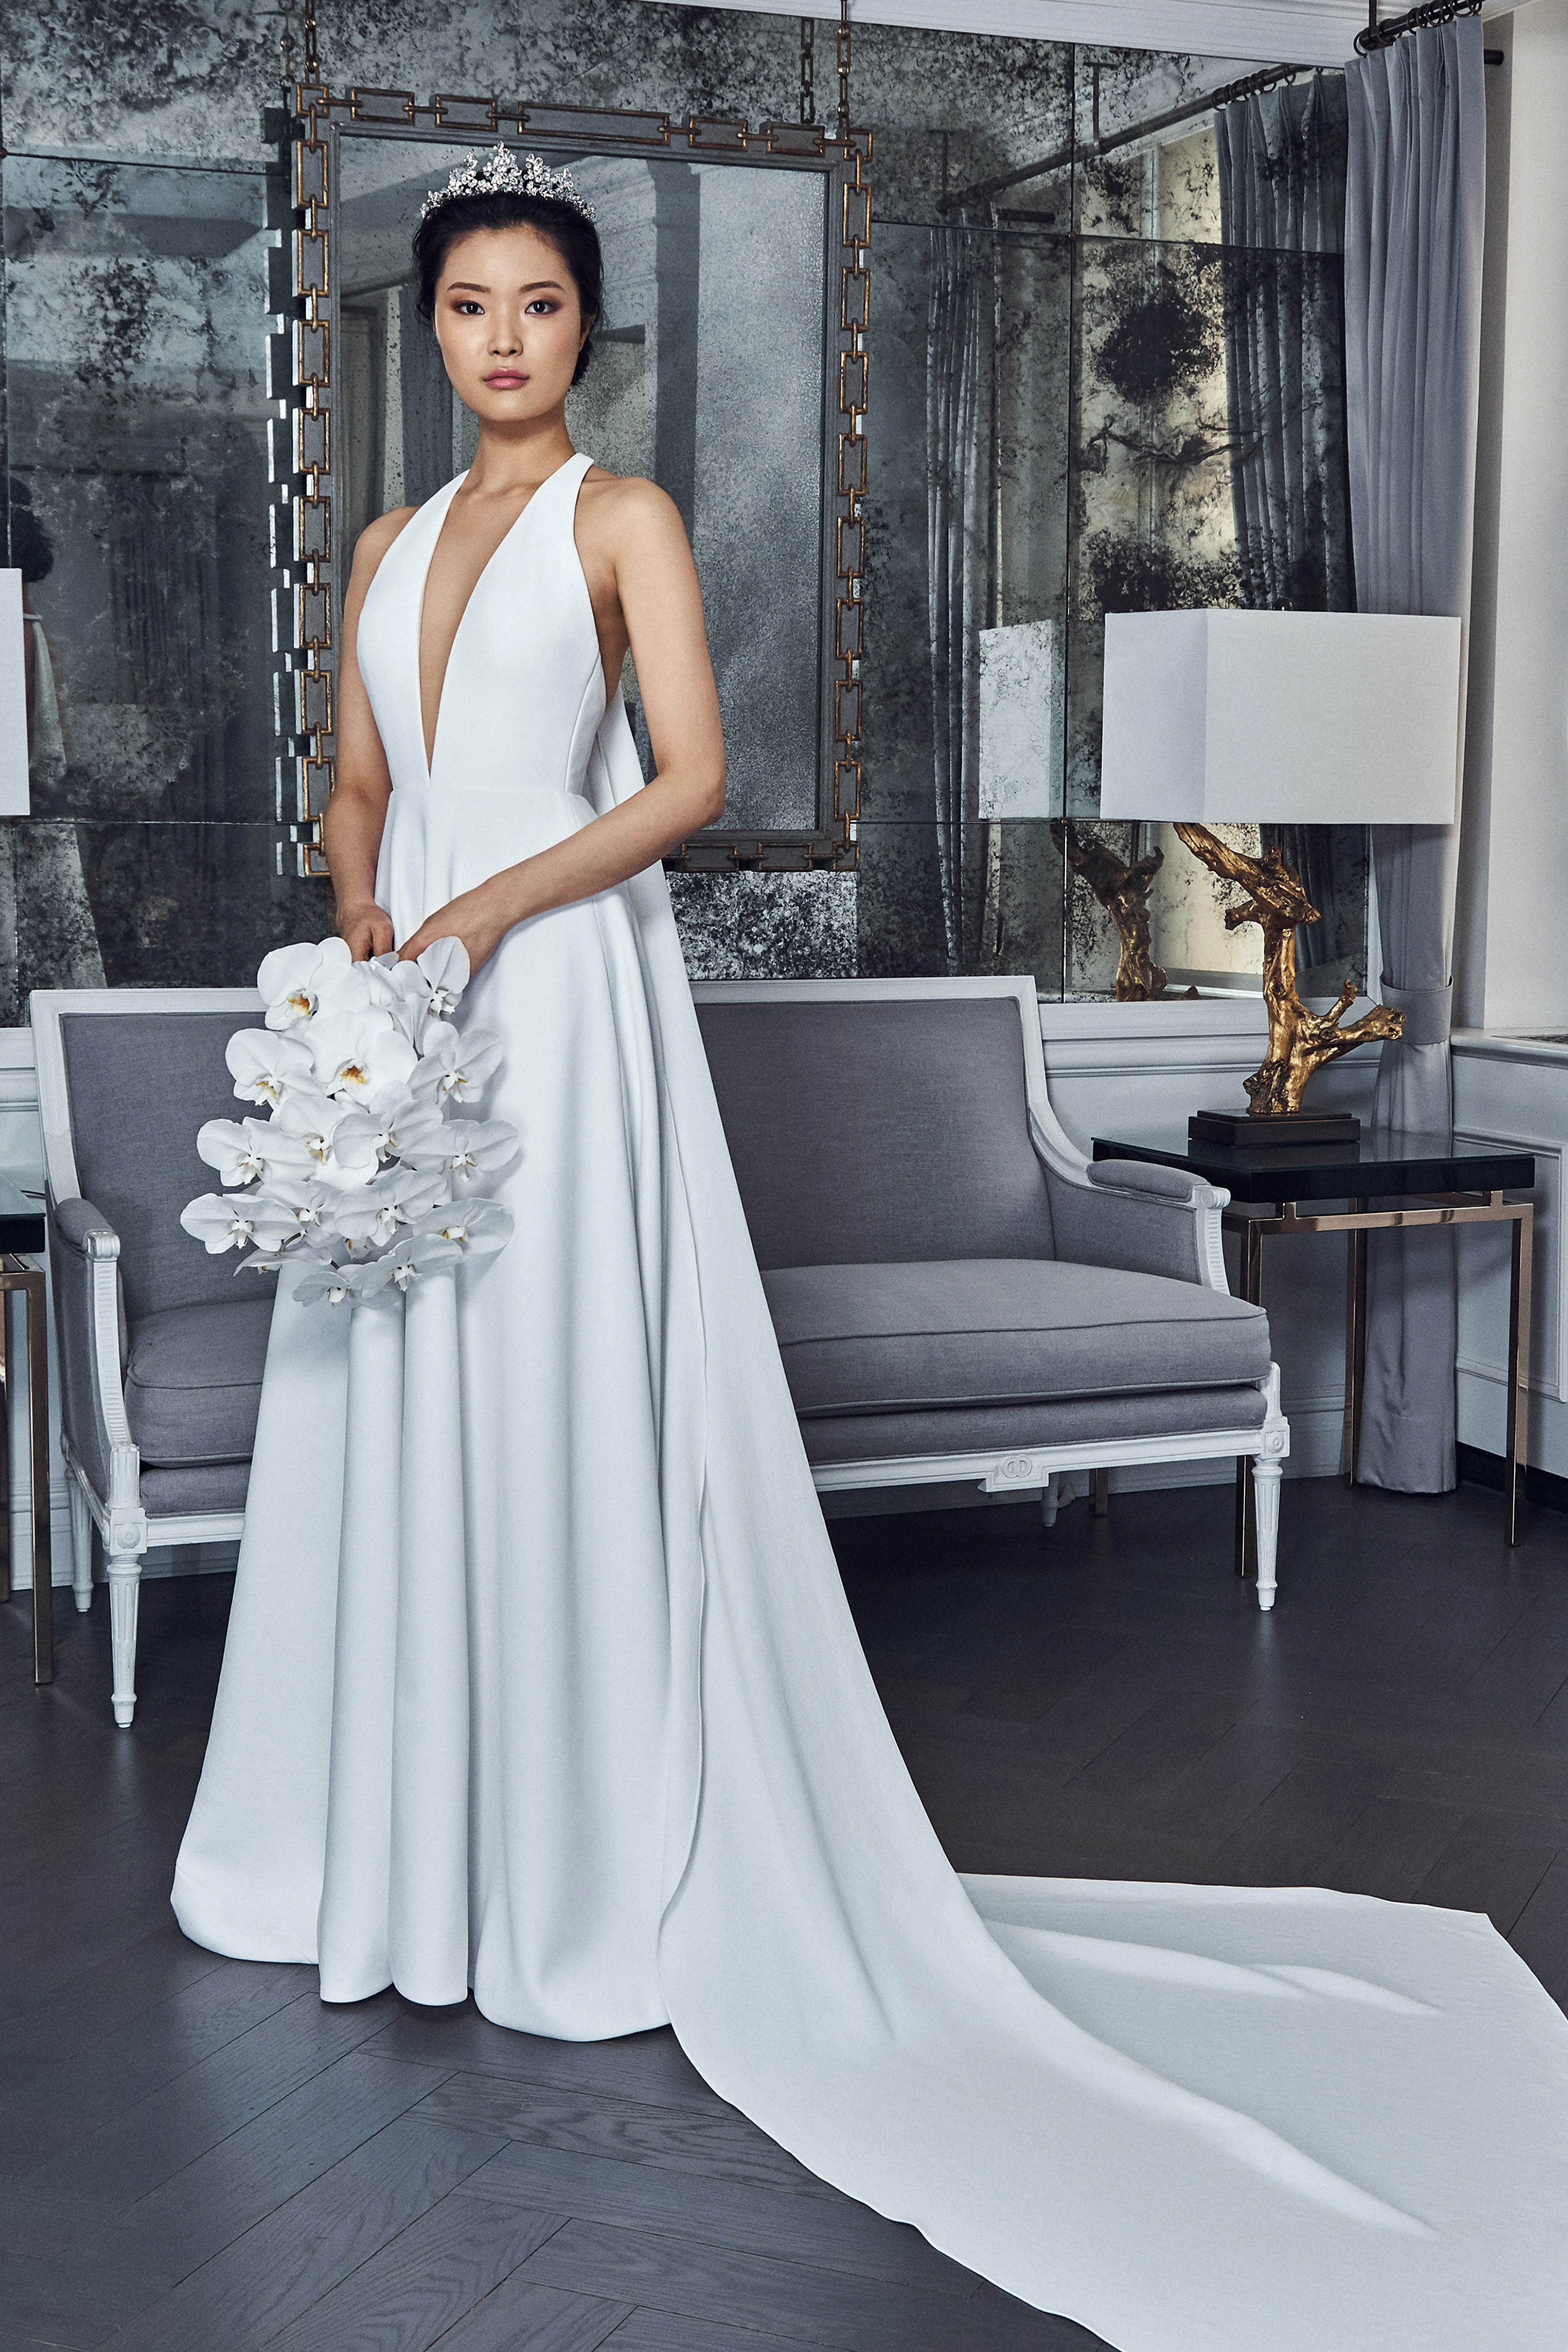 romona keveza collection wedding dress spring 2019 deep v a-line